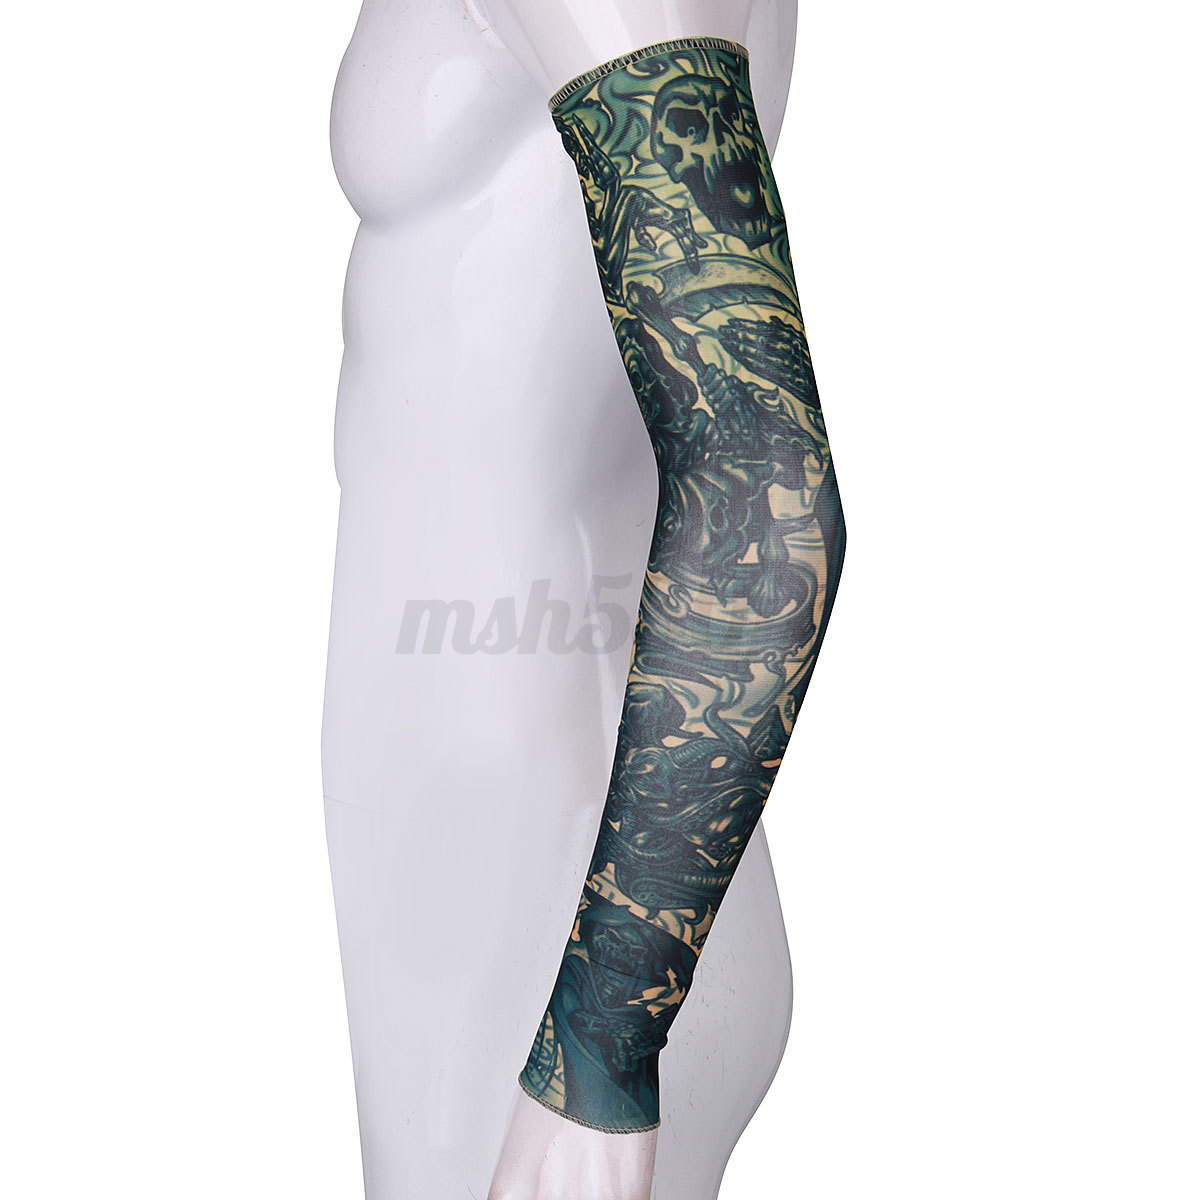 1 3 5x nylon spandex stretchy temporary tattoo sleeves arm for Fake tattoo sleeves toronto